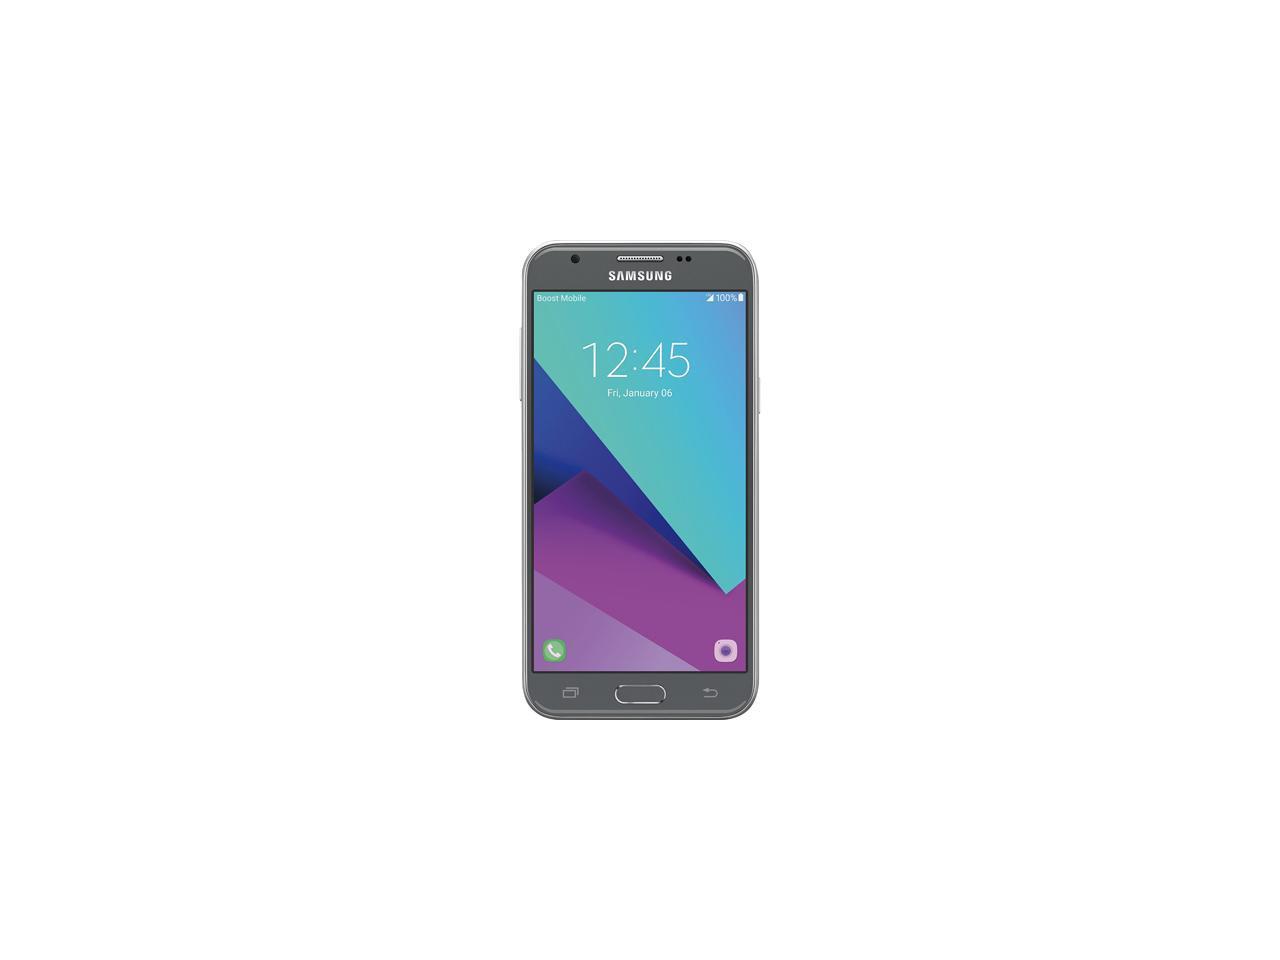 LG Tribute HD Virgin Mobile & Samsung Galaxy J3 Boost Mobile FAR + FS